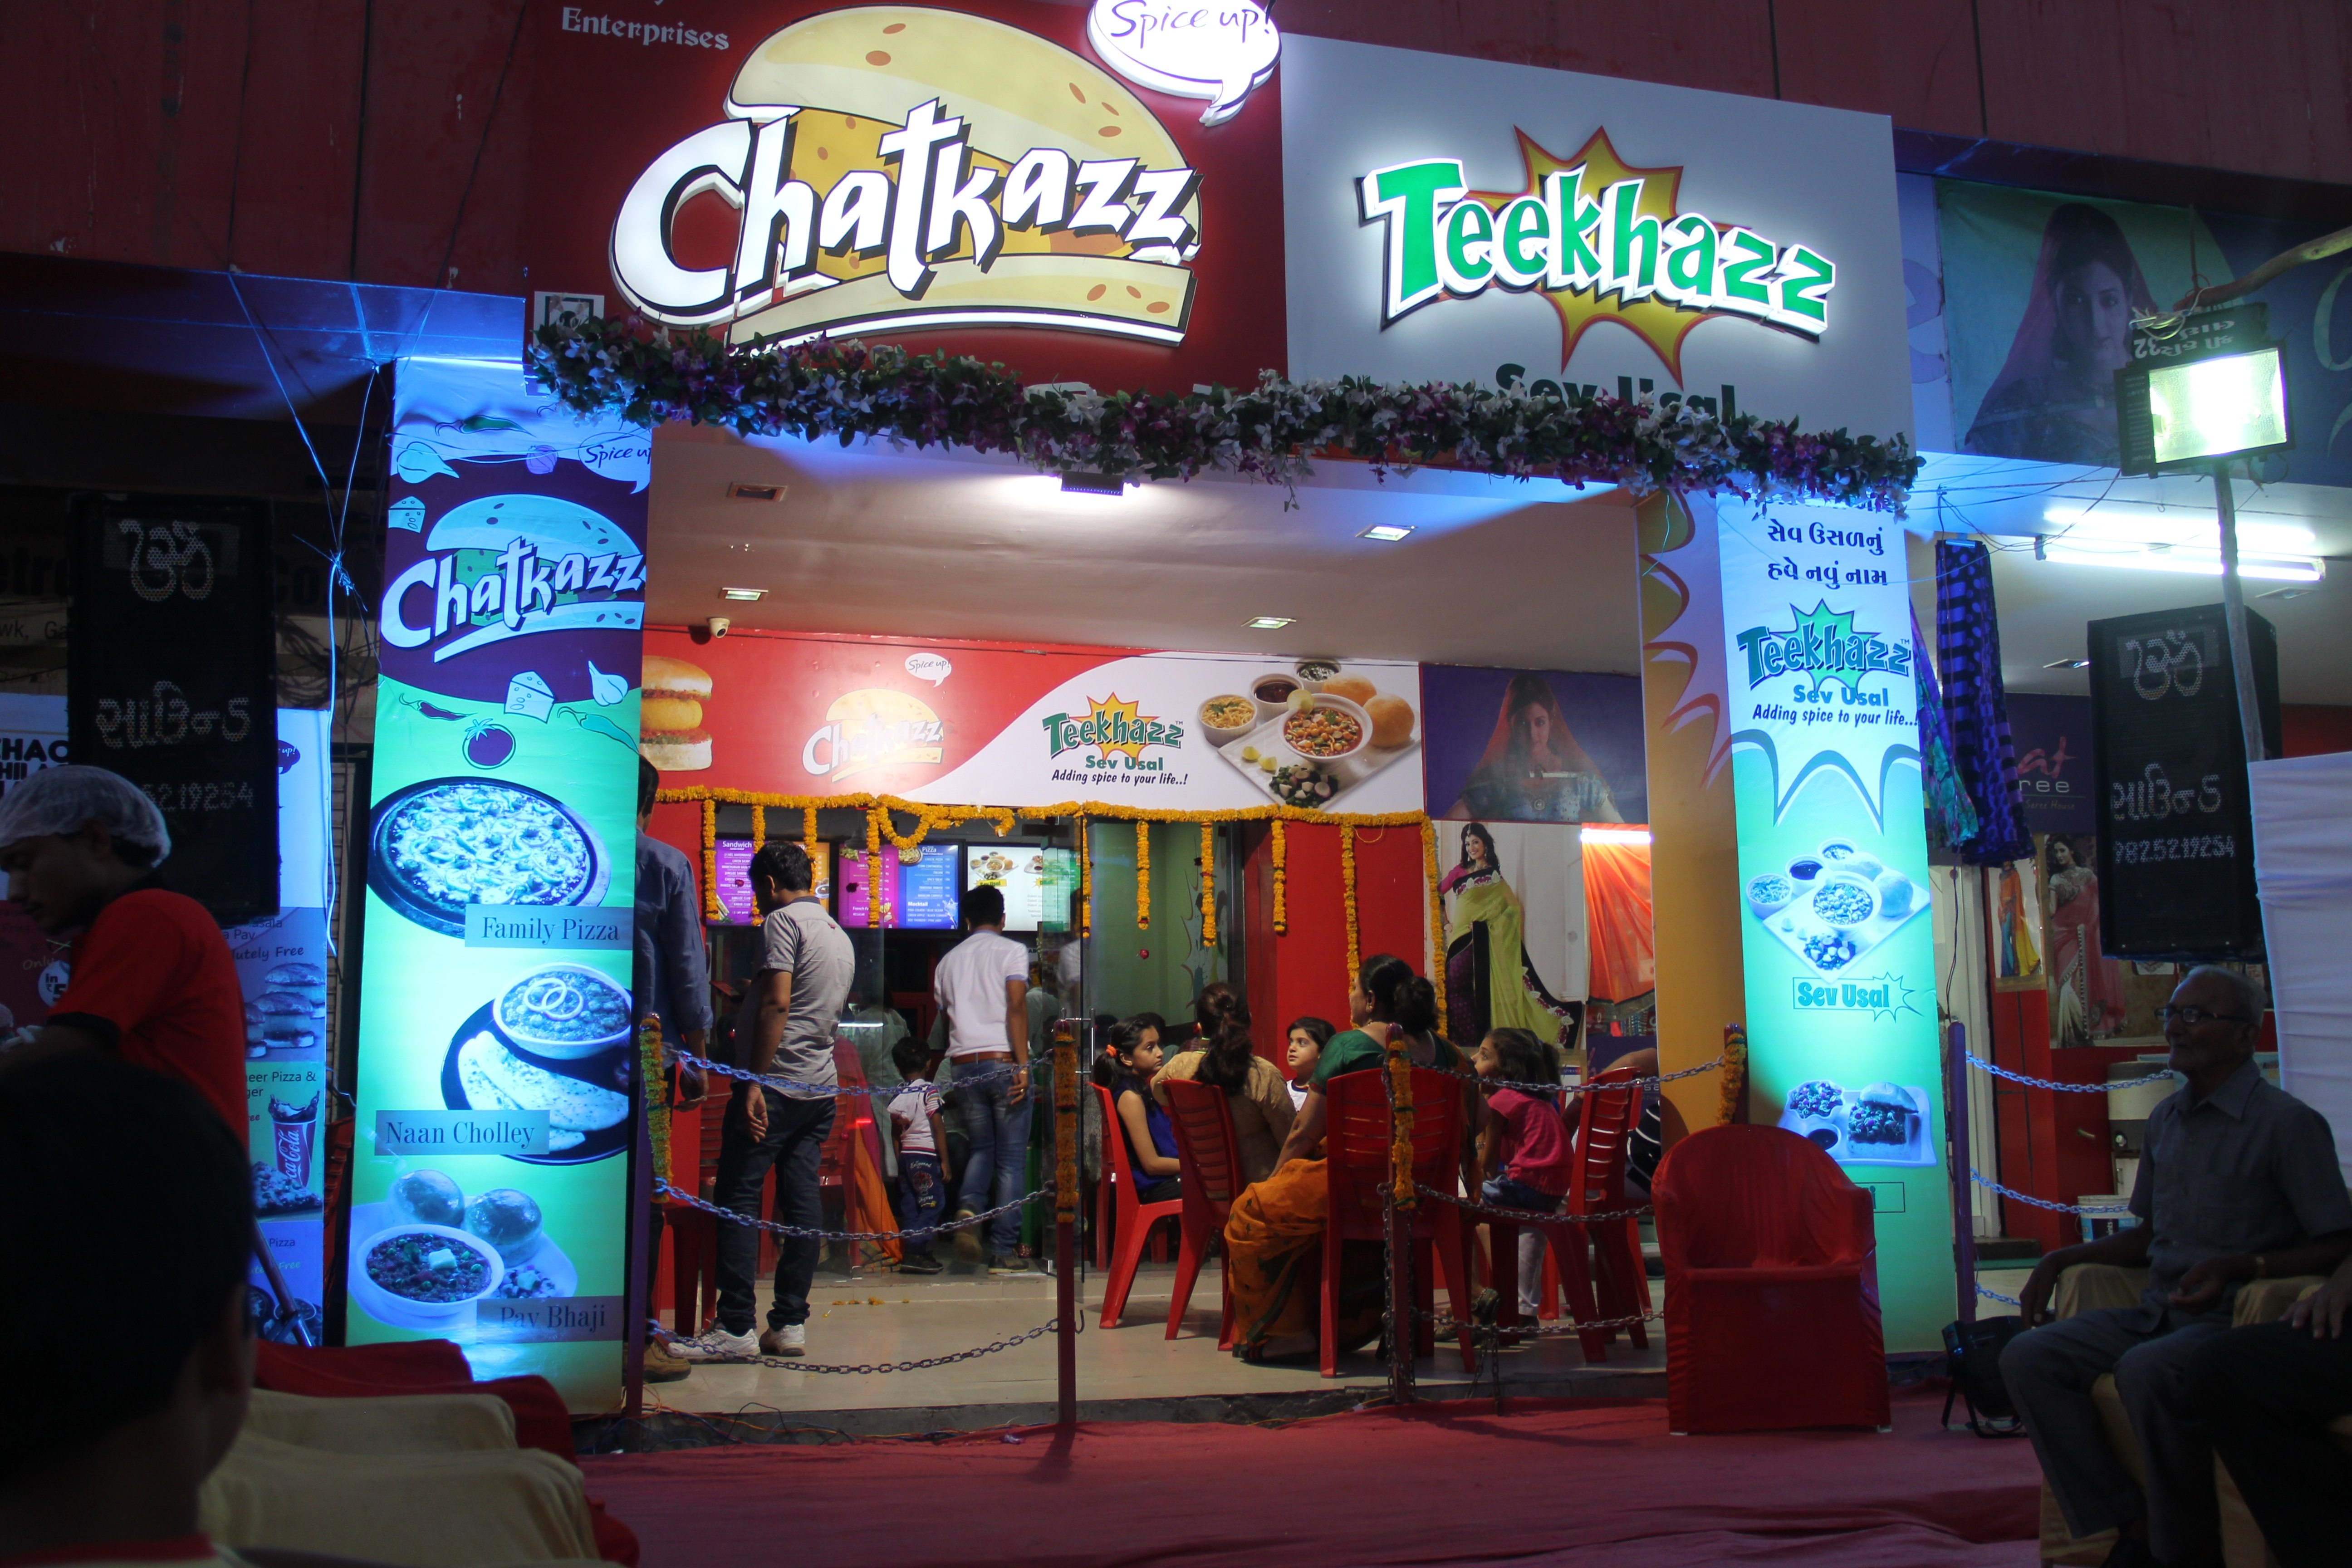 Now yr favorite Chatkazz and Teekhazz in Gandhidham